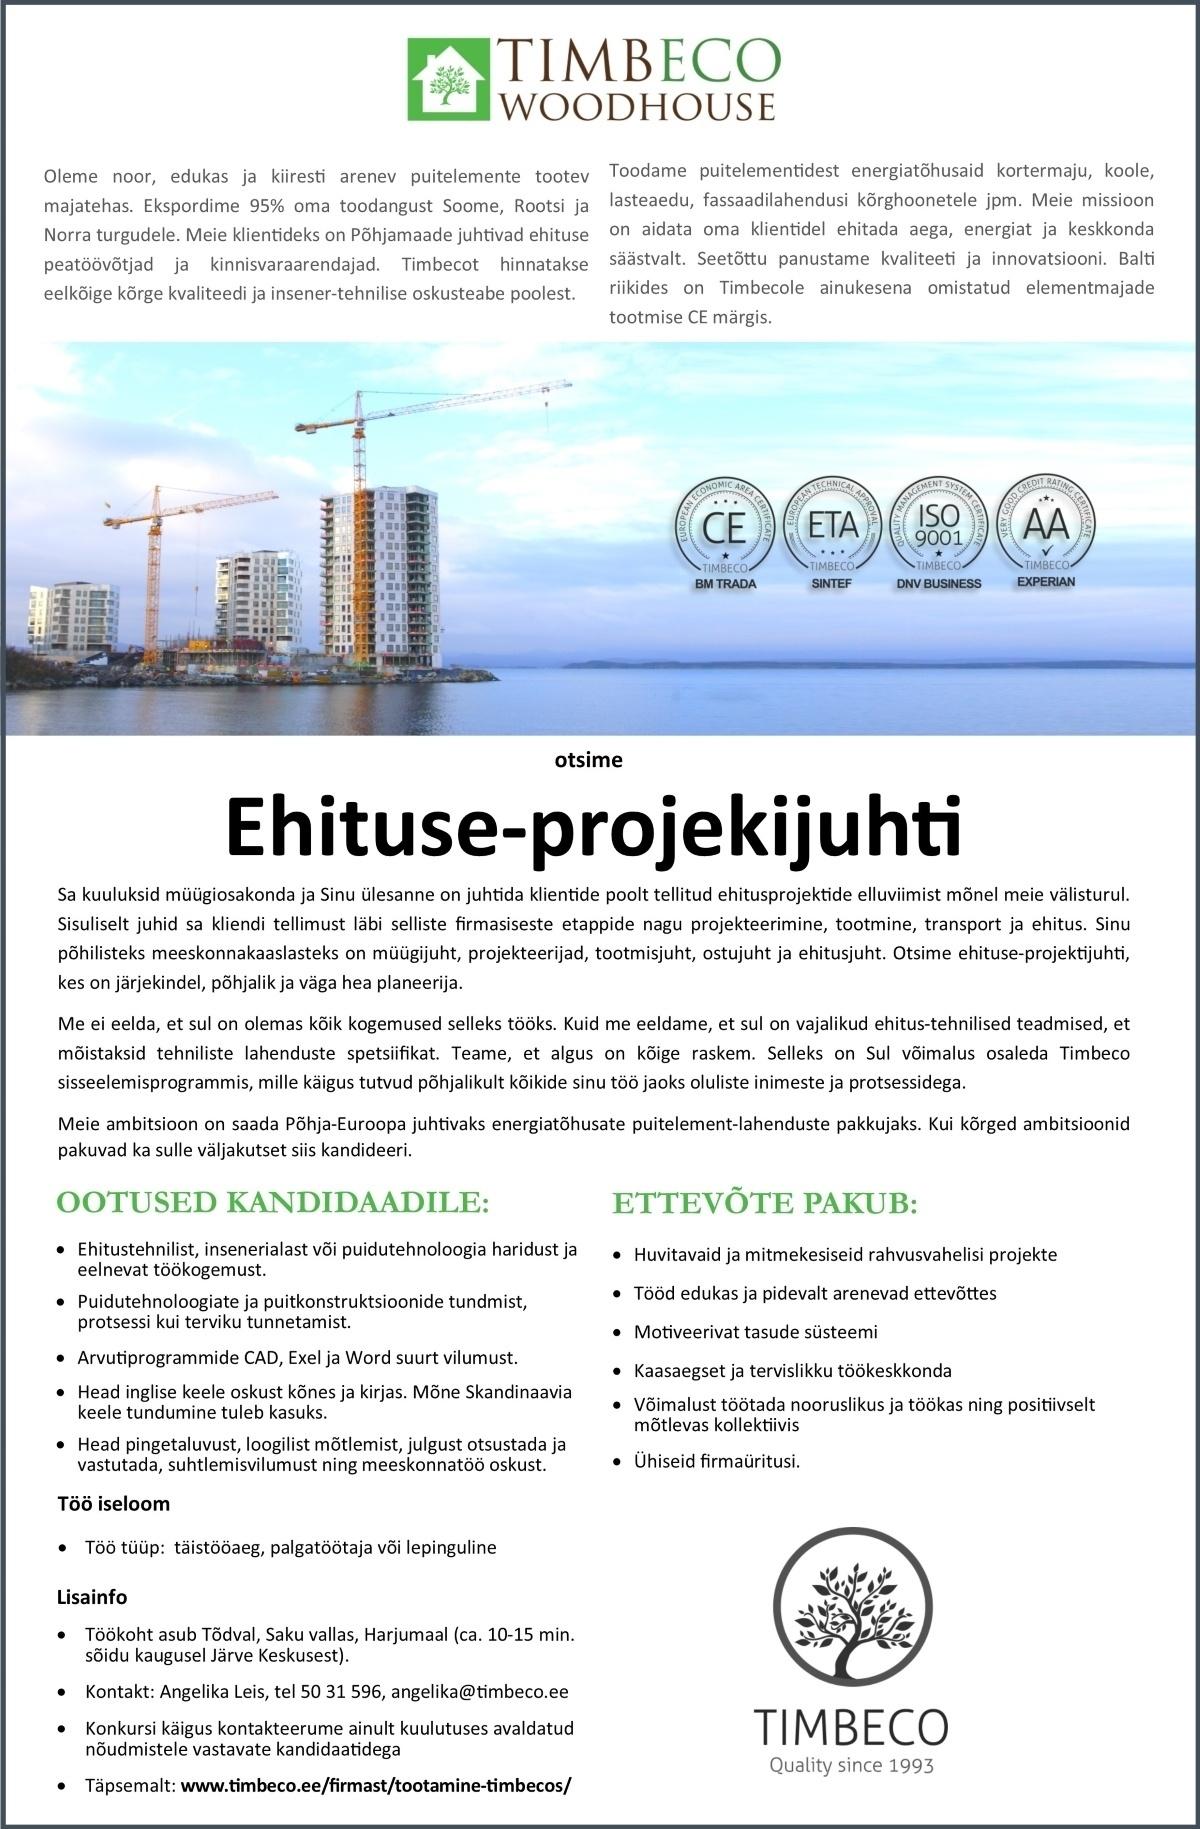 4b39e7b19de CV Keskus tööpakkumine Ehituse - projektijuht